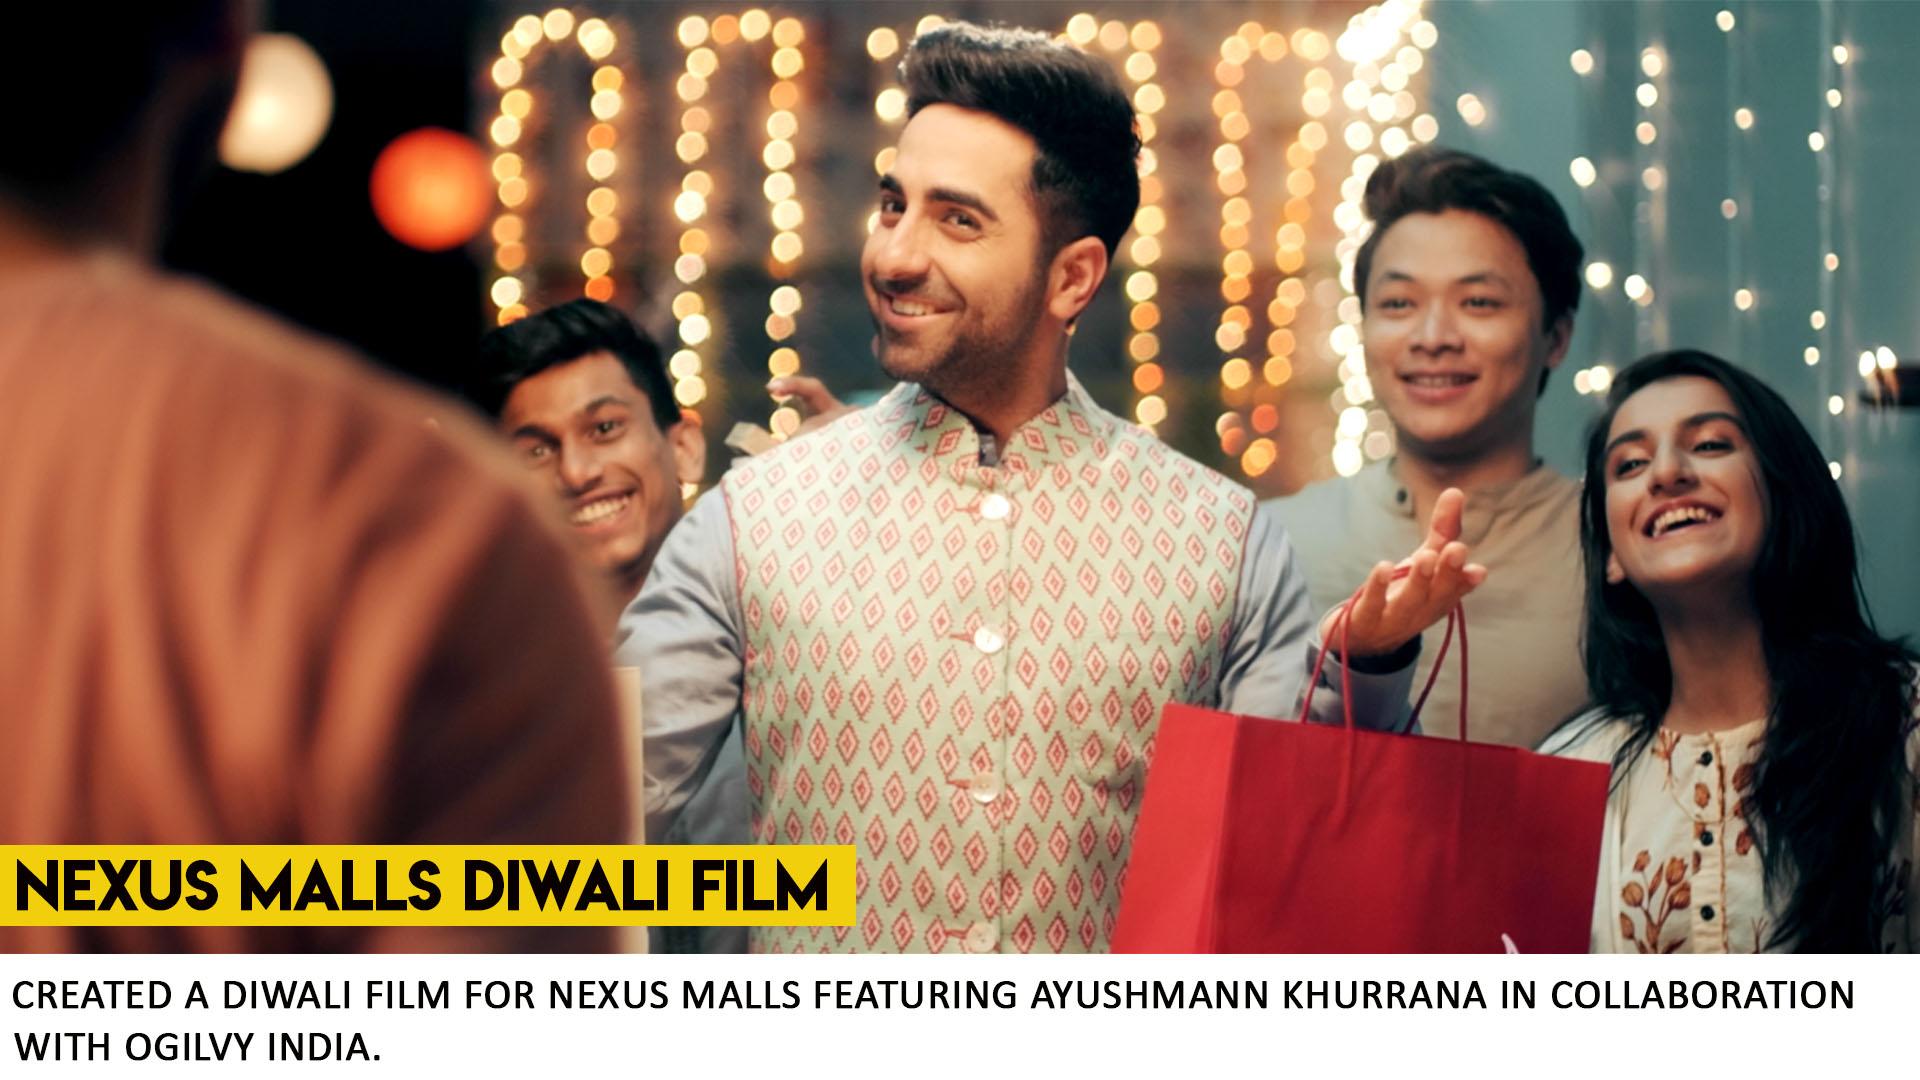 Nexus Malls Diwali ad with Ayushmann